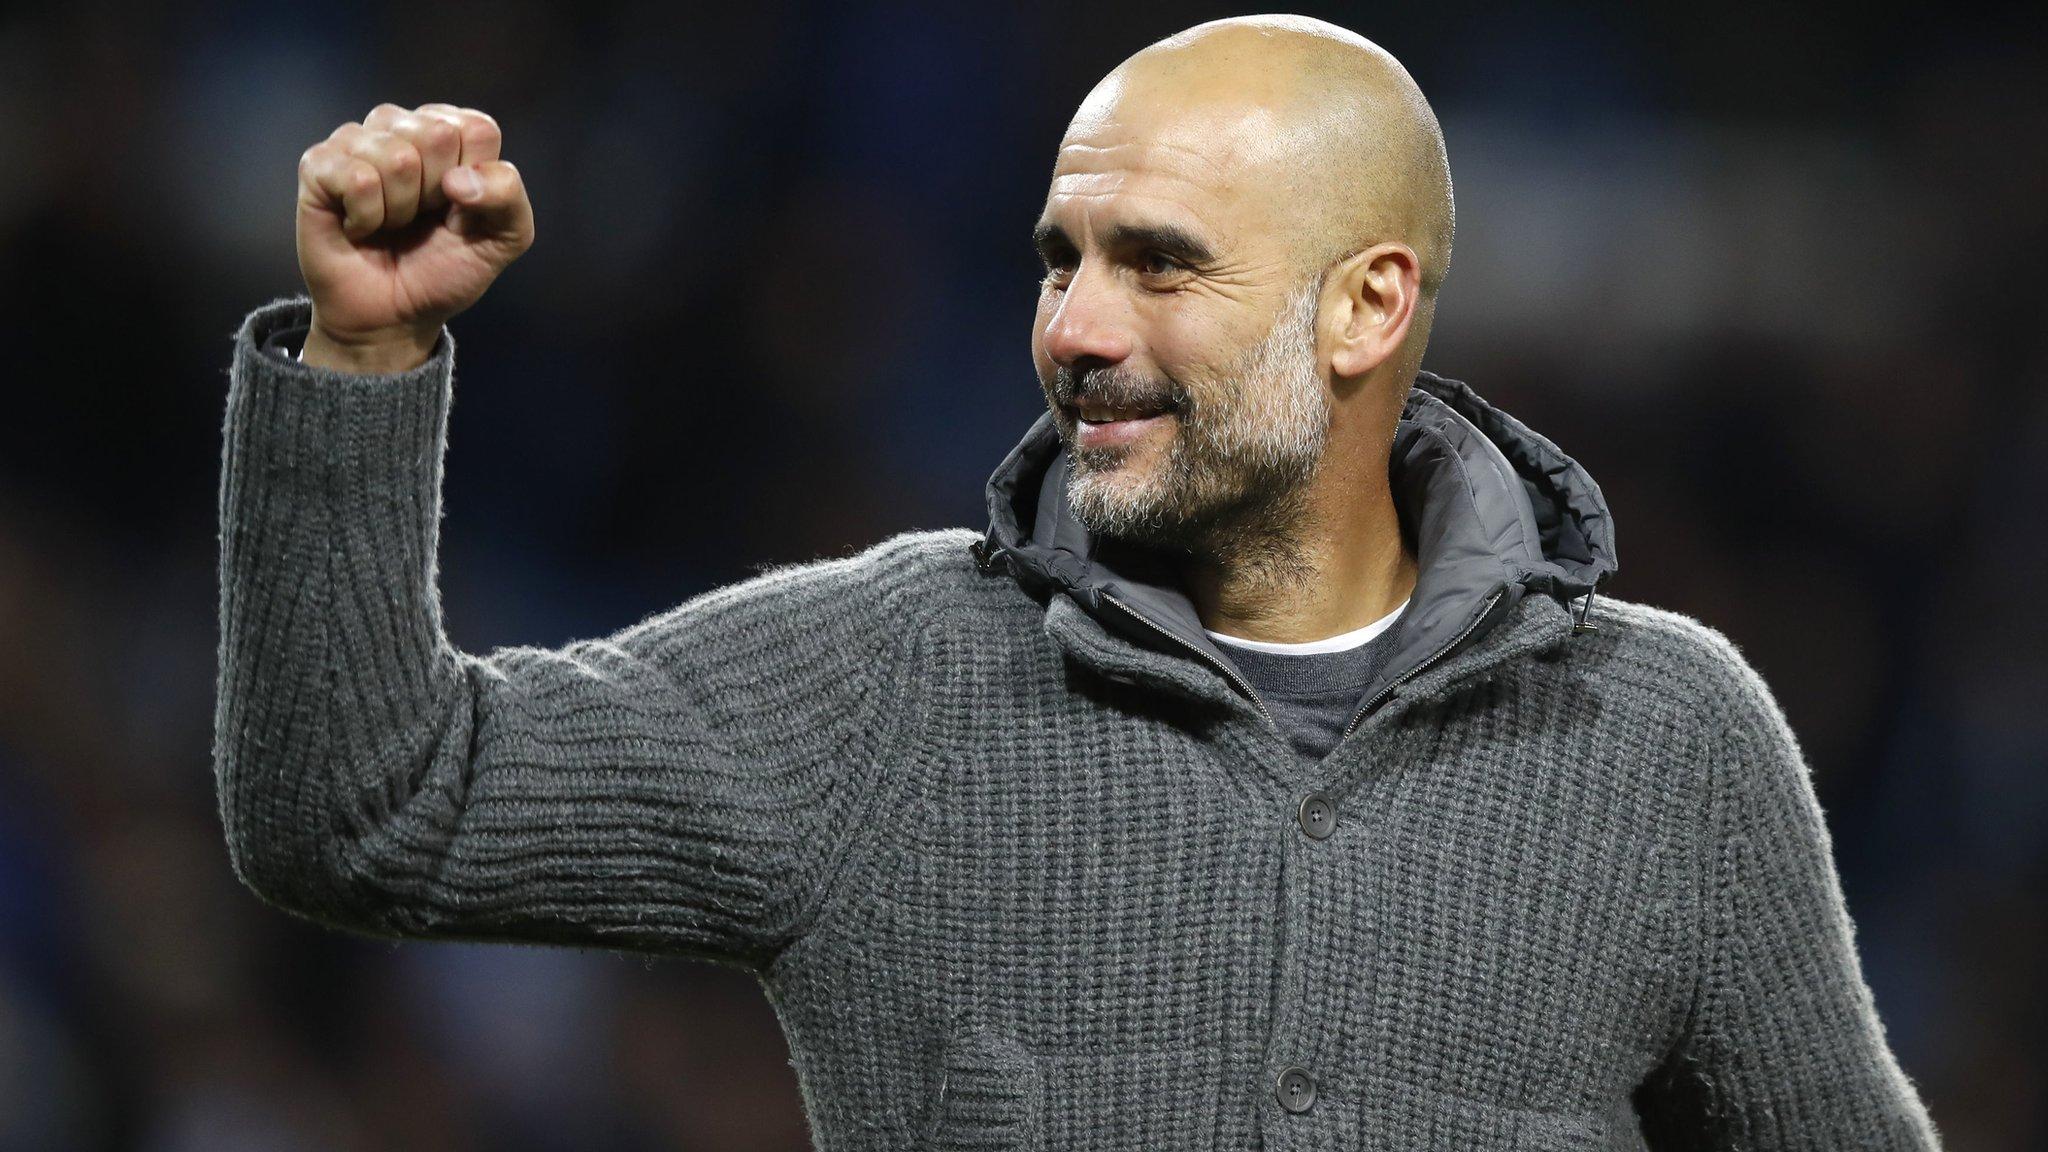 Man City to auction off Pep Guardiola's 'coatigan'